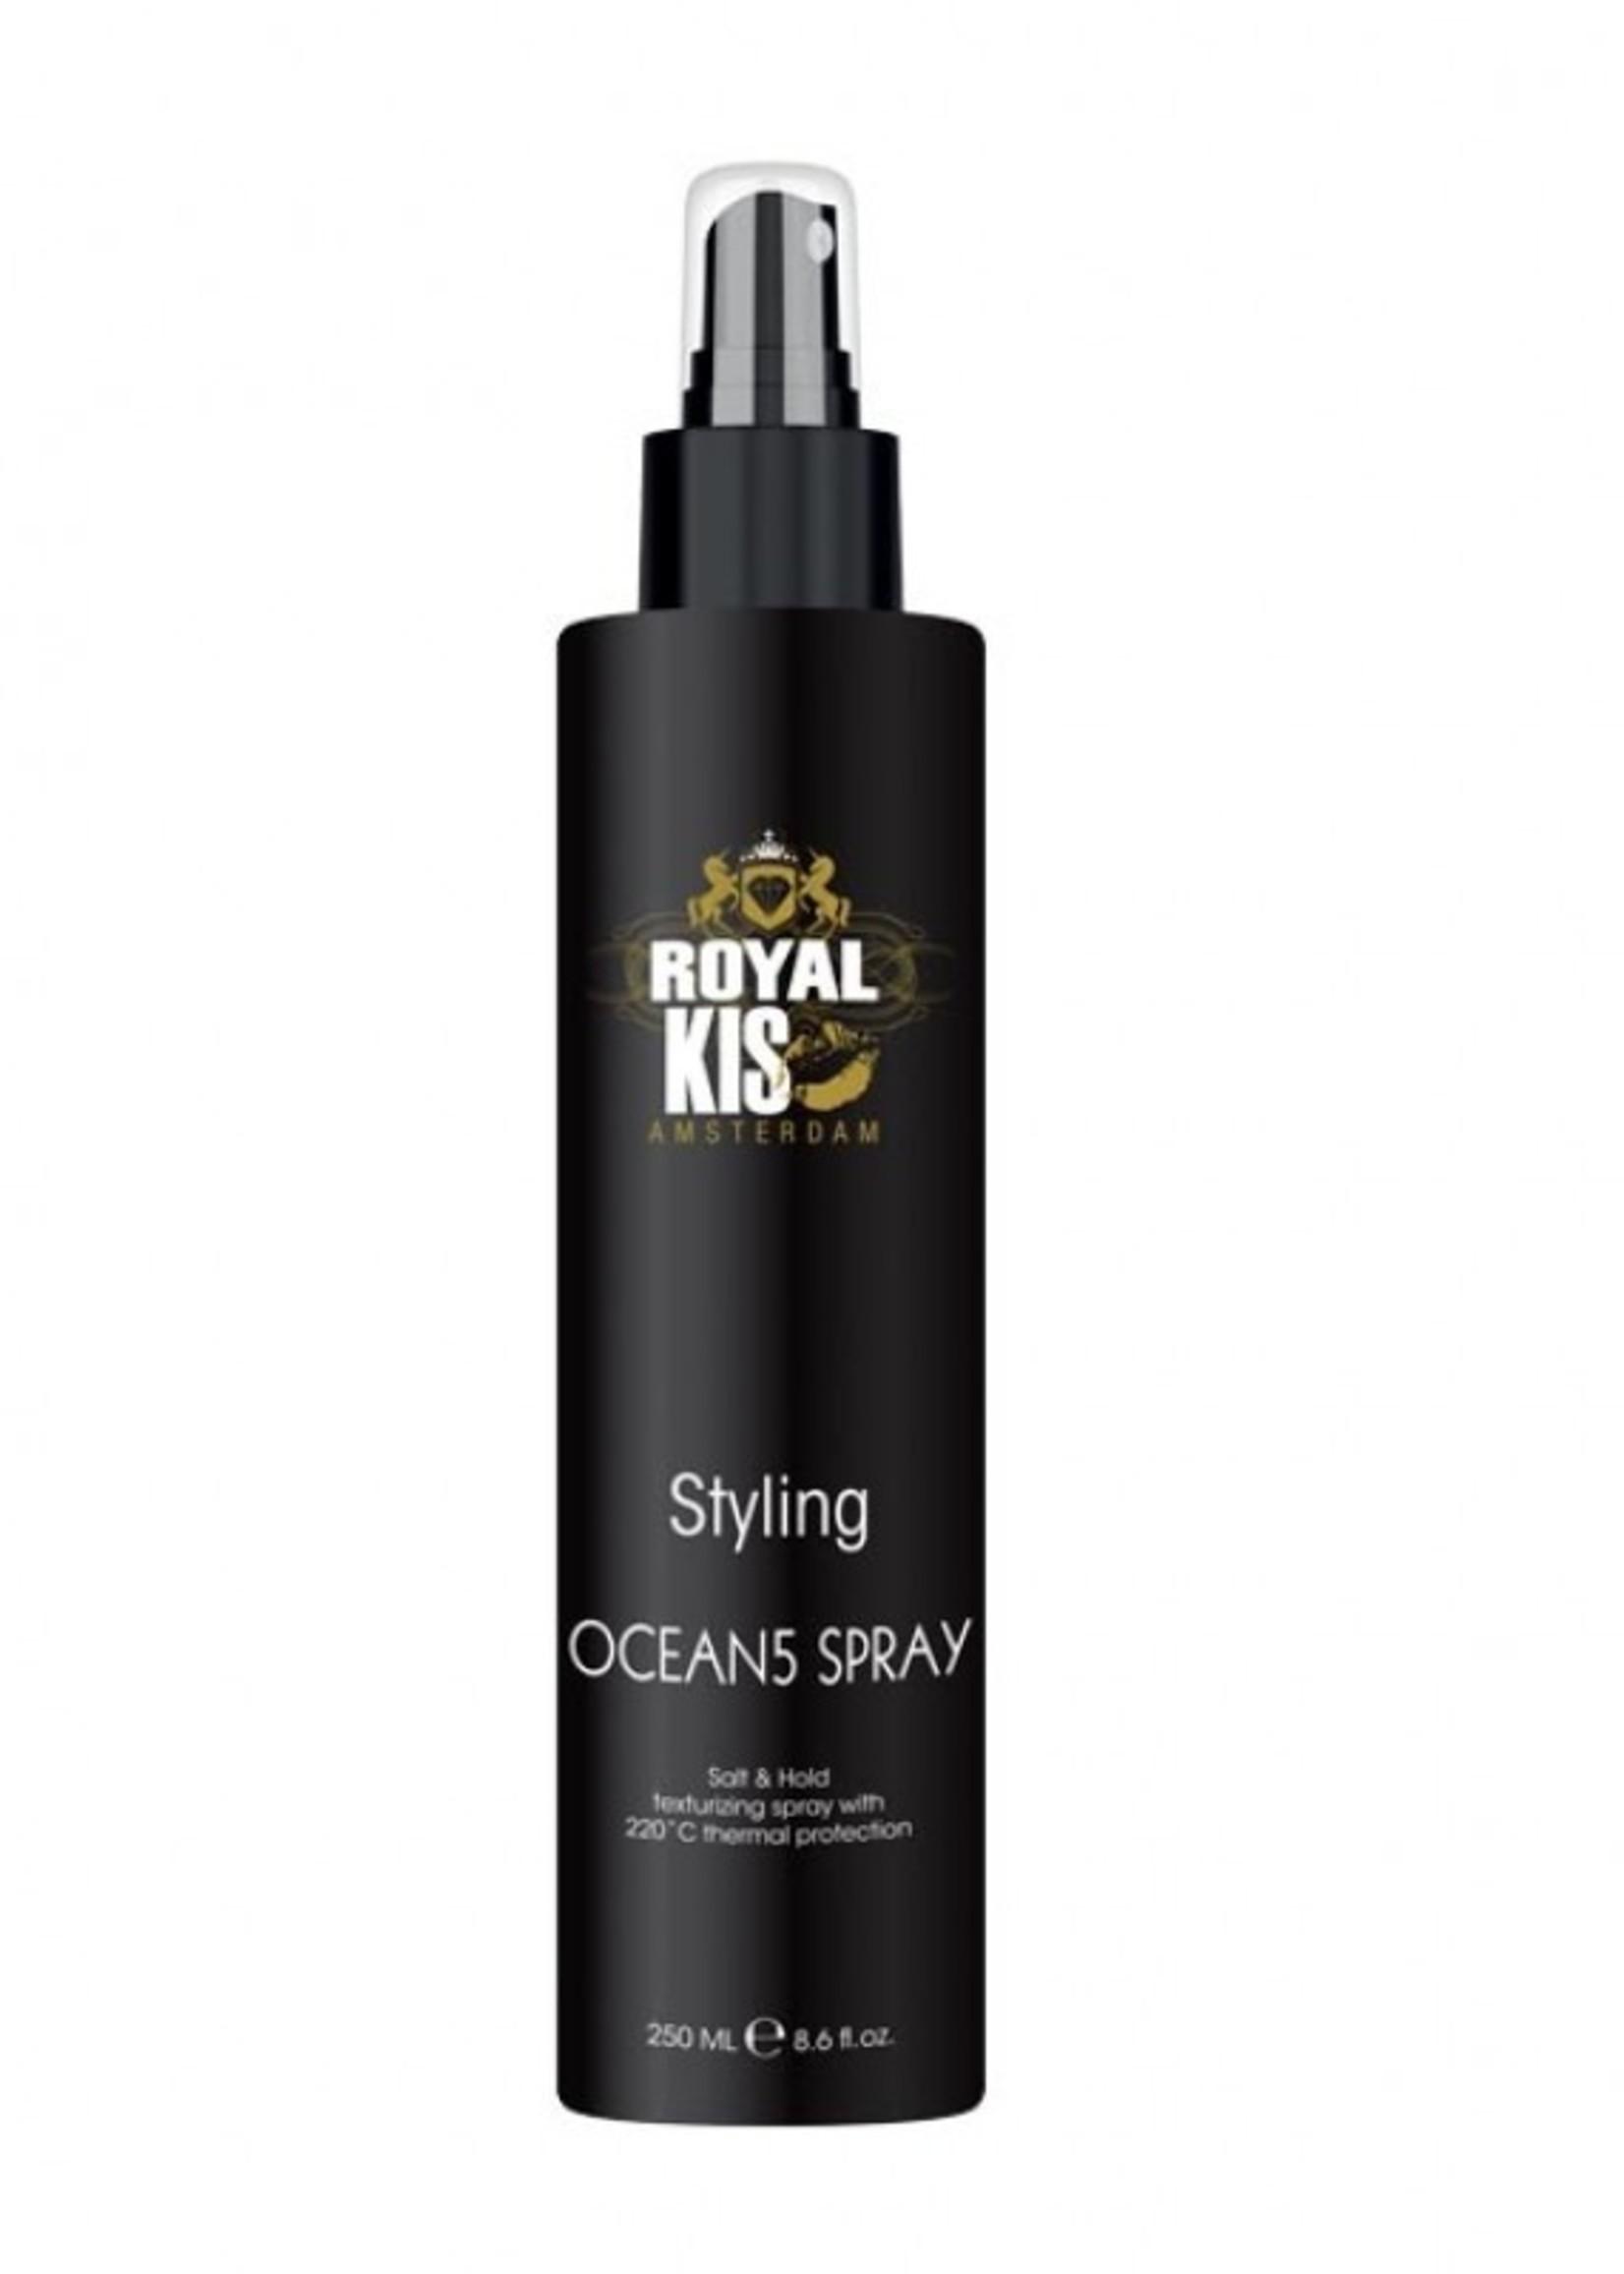 Royal KIS Ocean5 spray -Royal  KIS